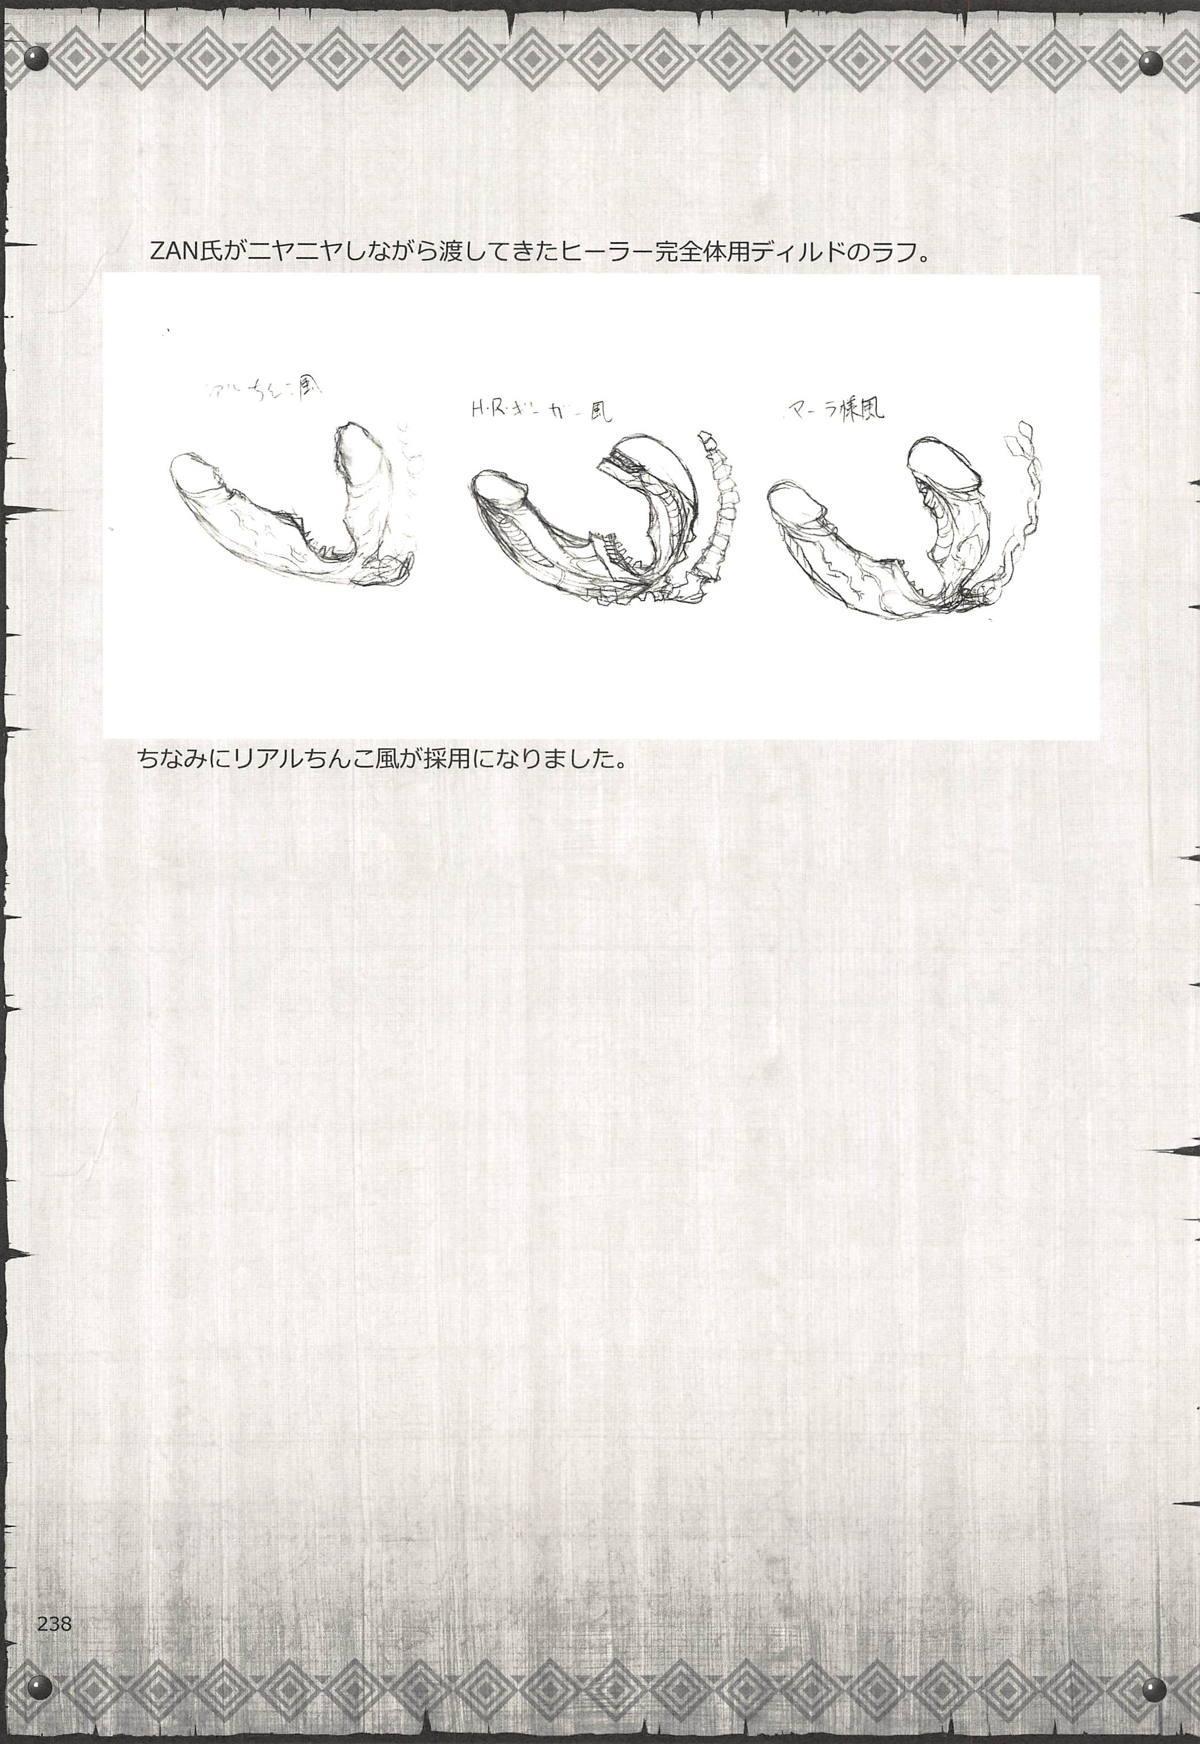 Monhan no Erohon G3 11→14+Juuhi+Omakebon Soushuuhen 235